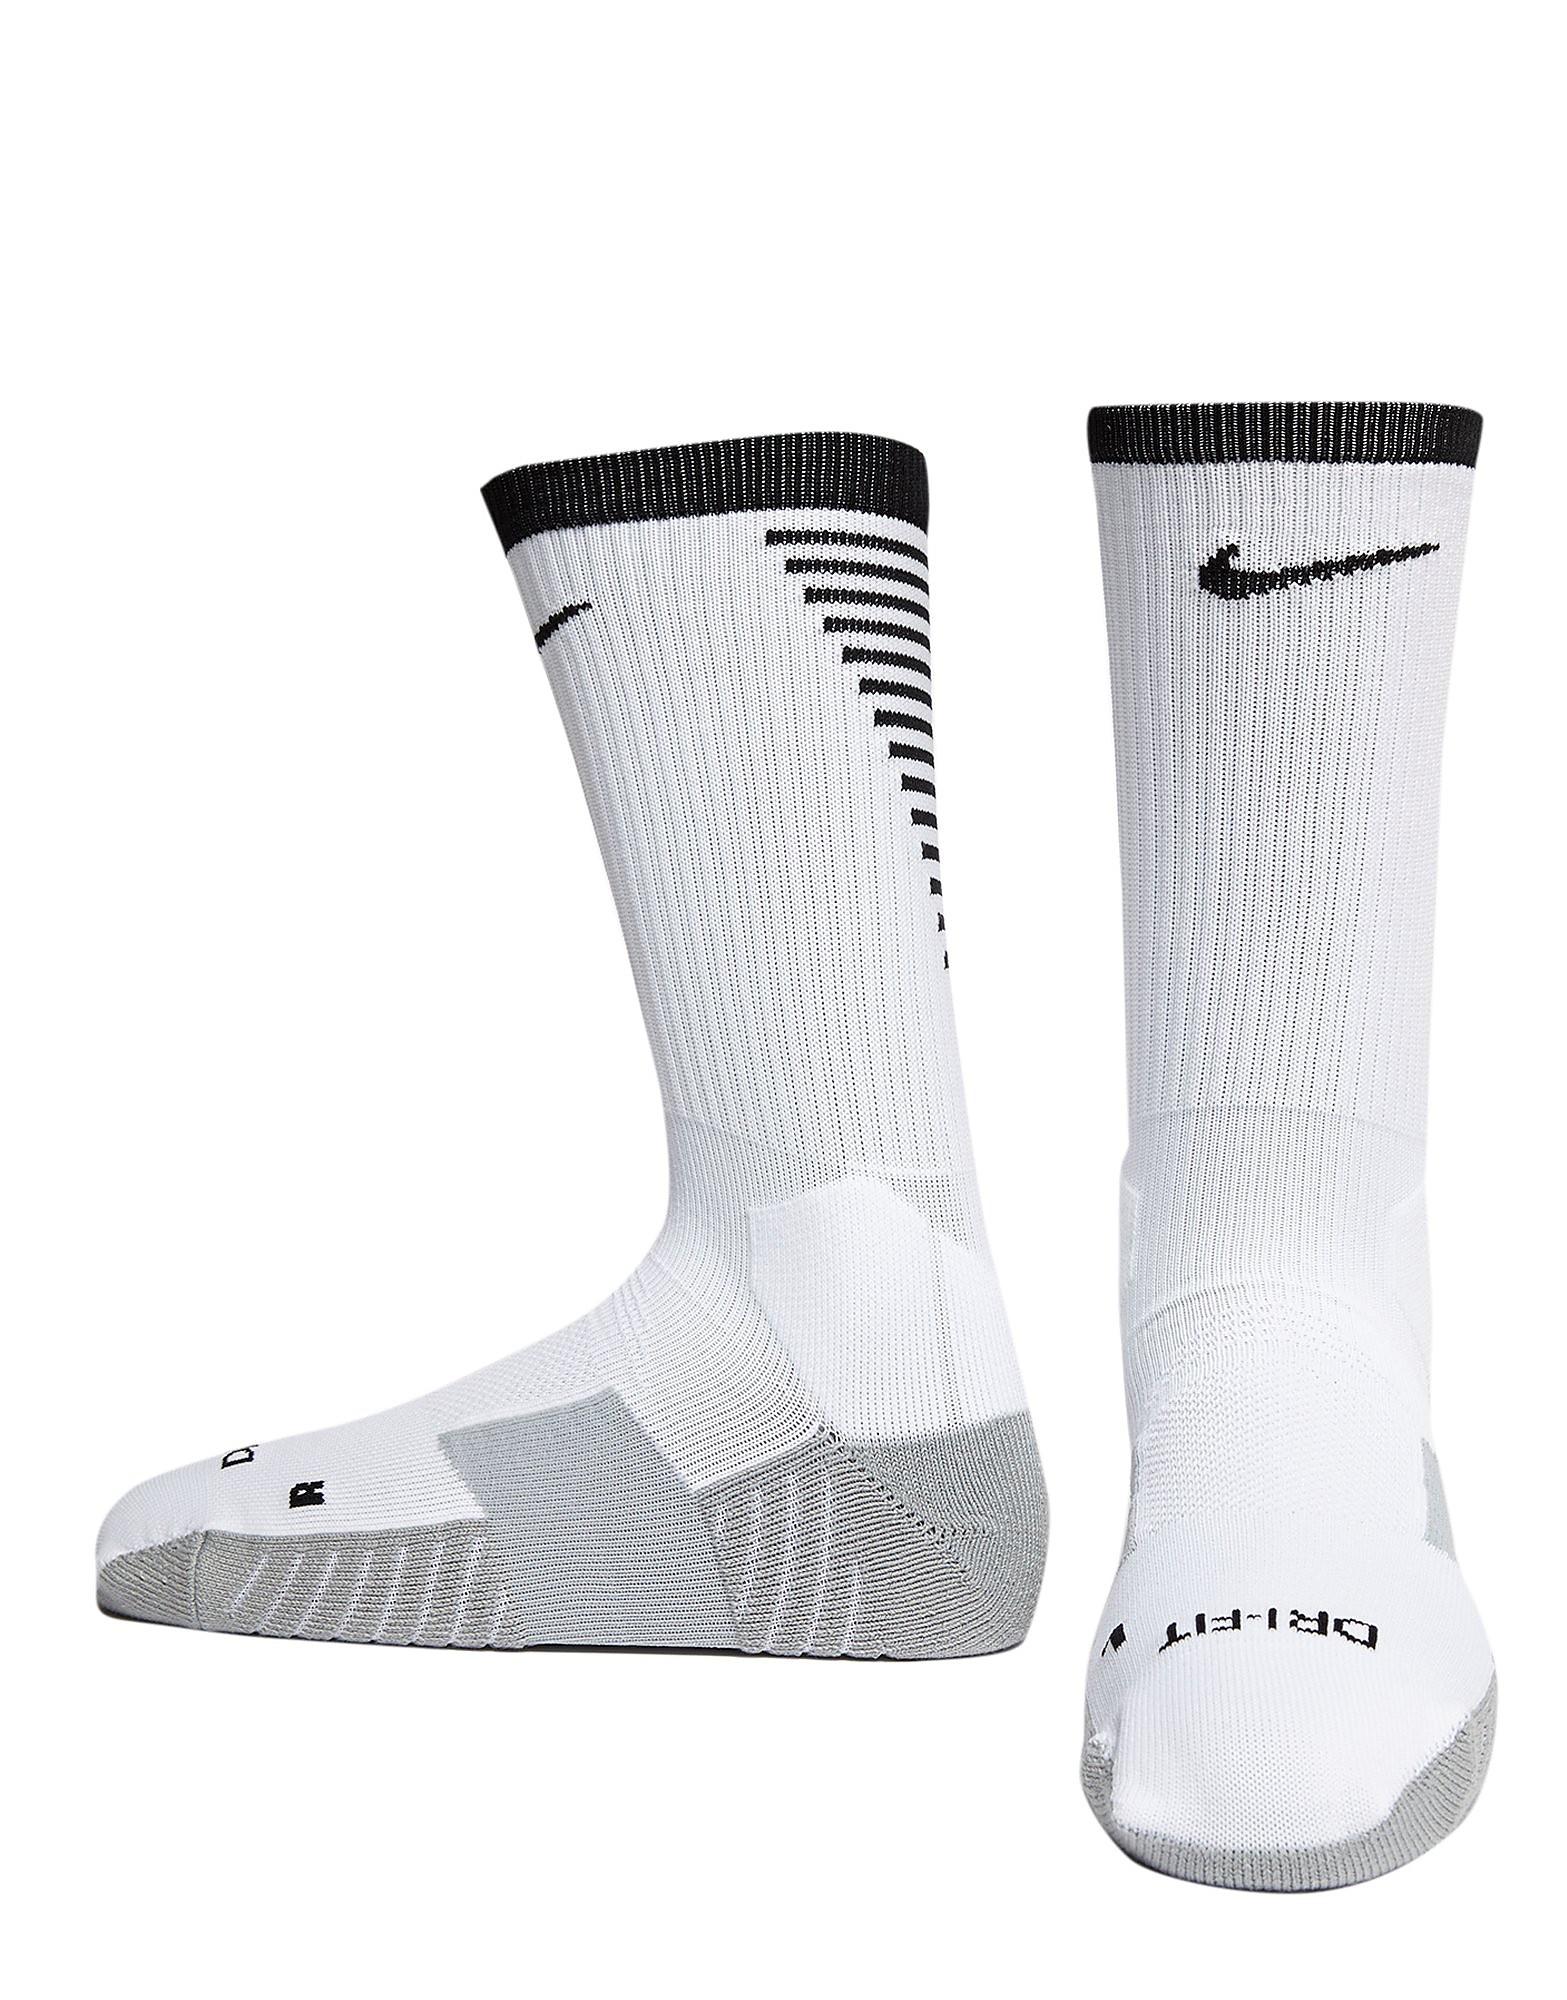 Nike Chaussettes Foot MatchFit Crew